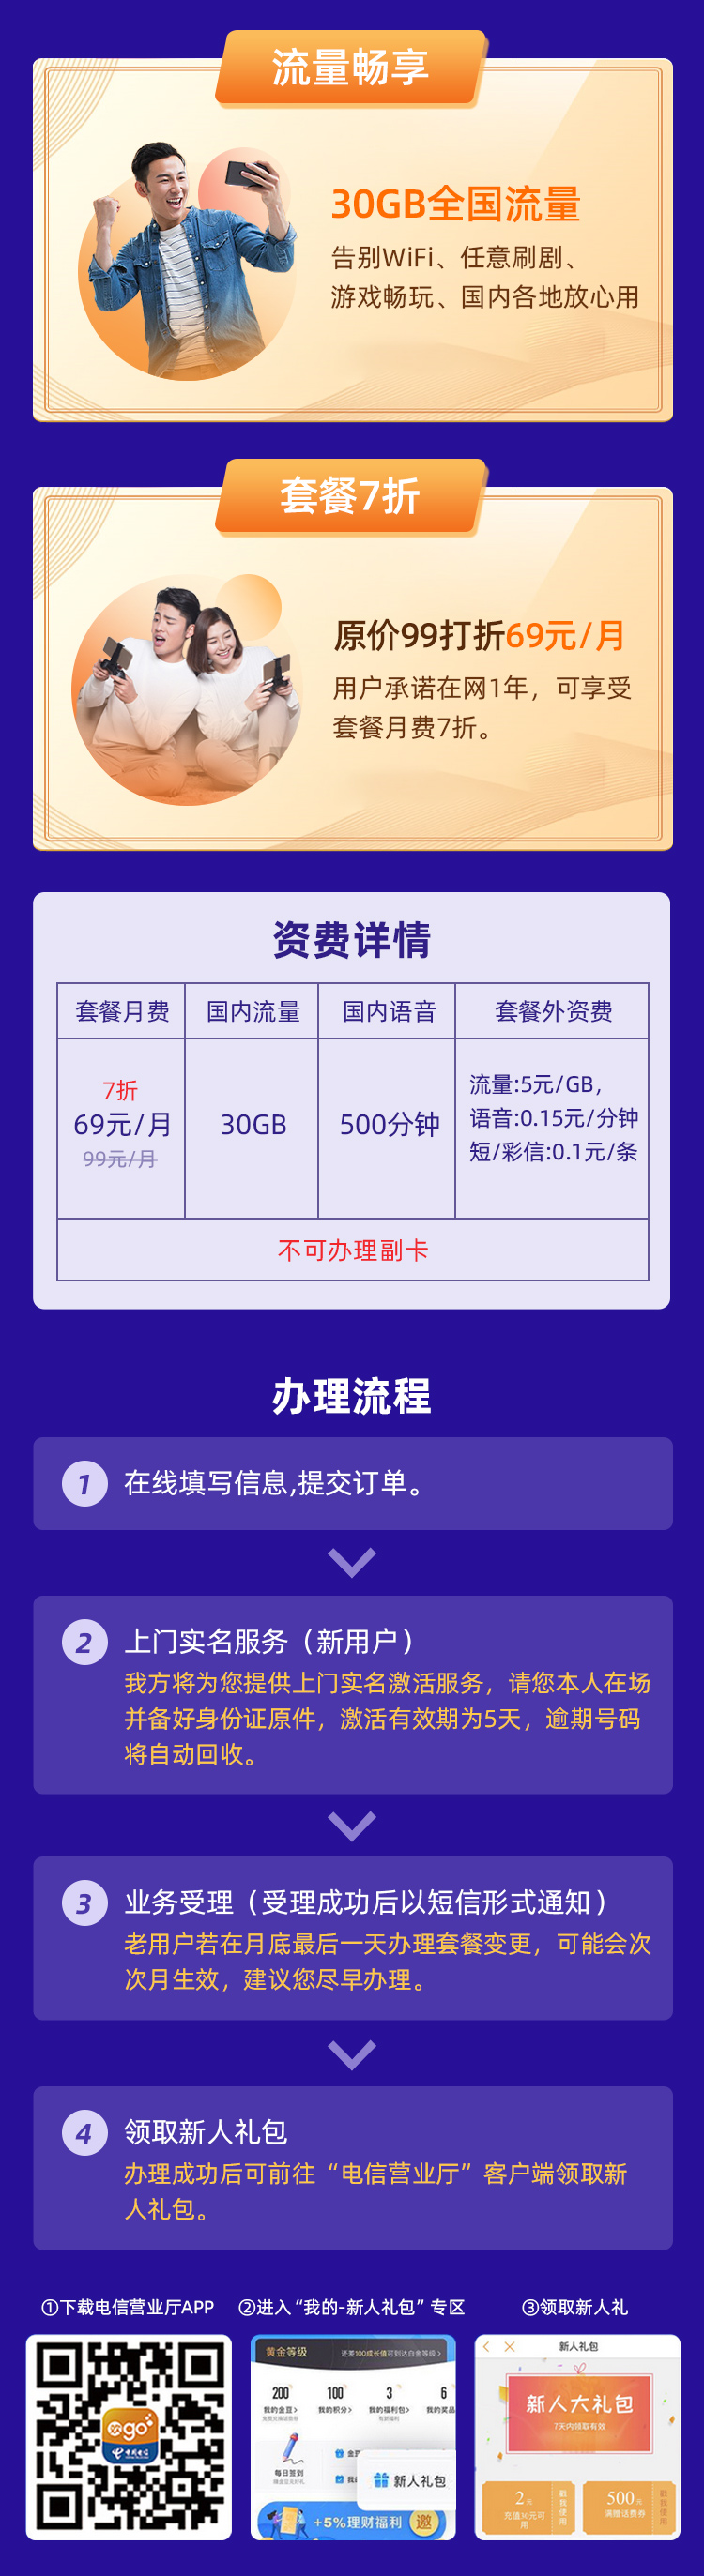 030430GB新用户(2)_02.jpg